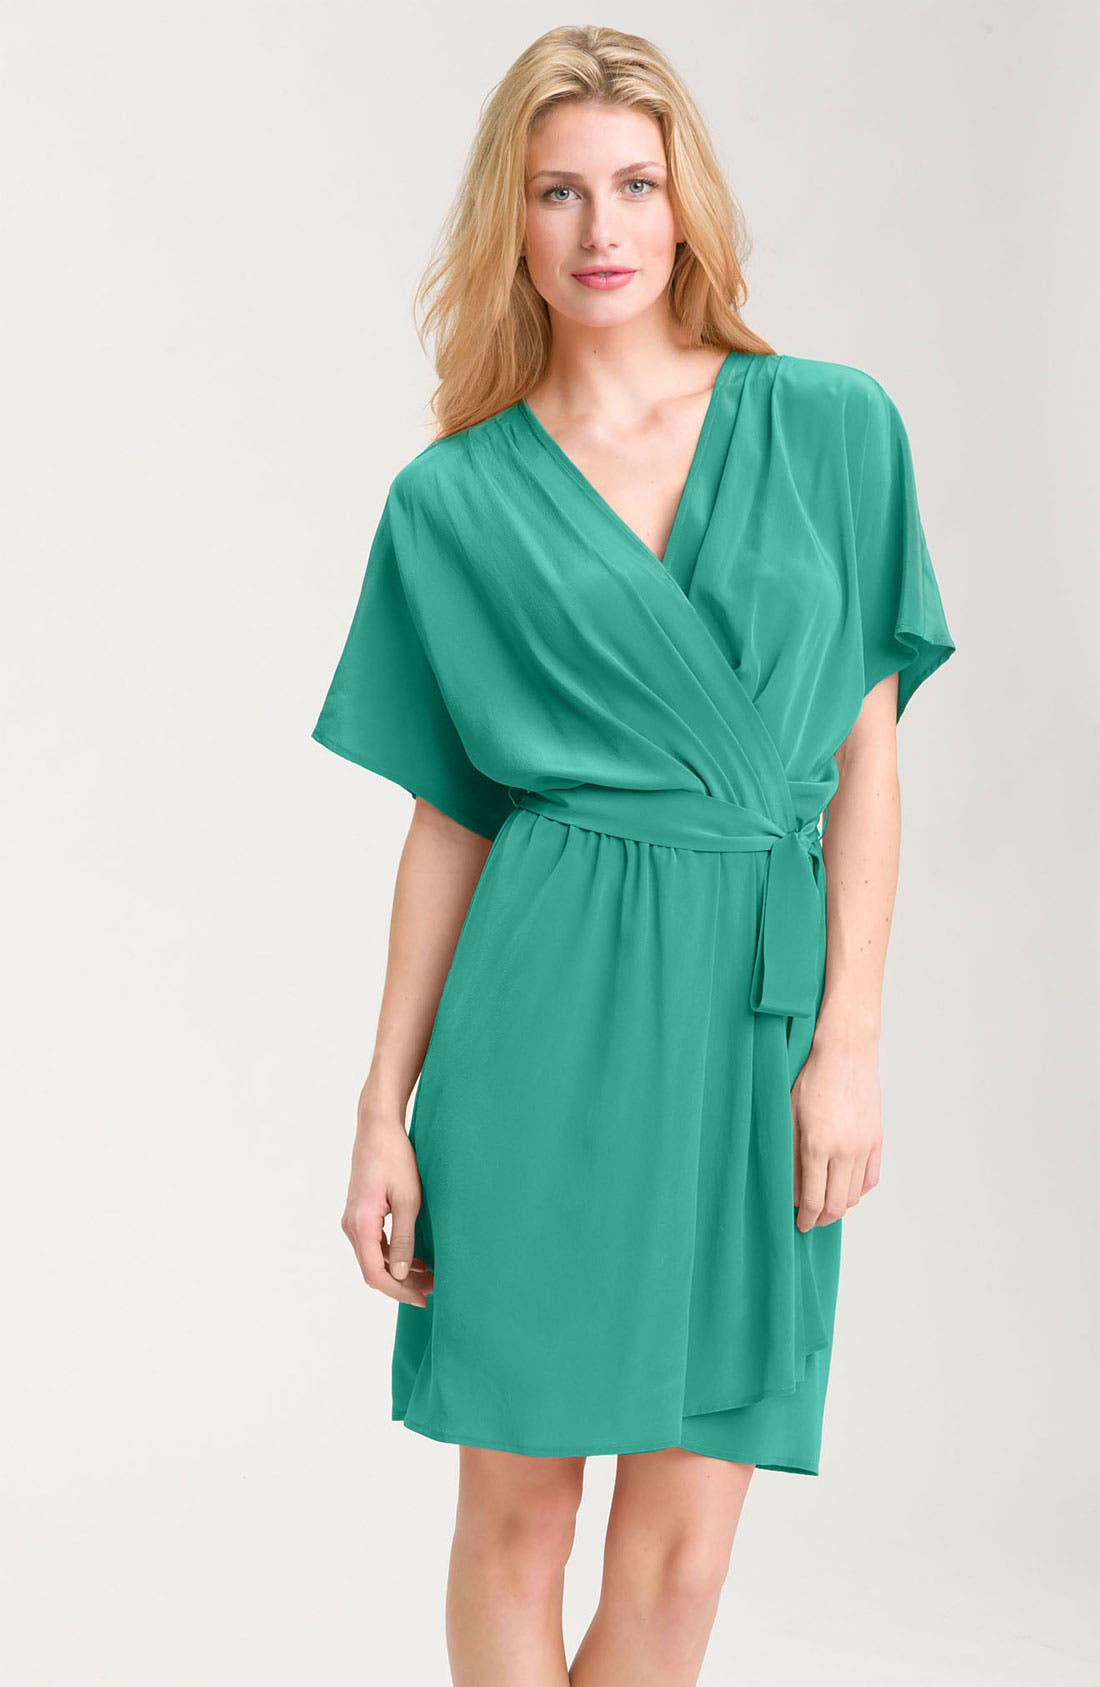 Alternate Image 1 Selected - Donna Morgan Faux Wrap Crêpe de Chine Dress (Petite)